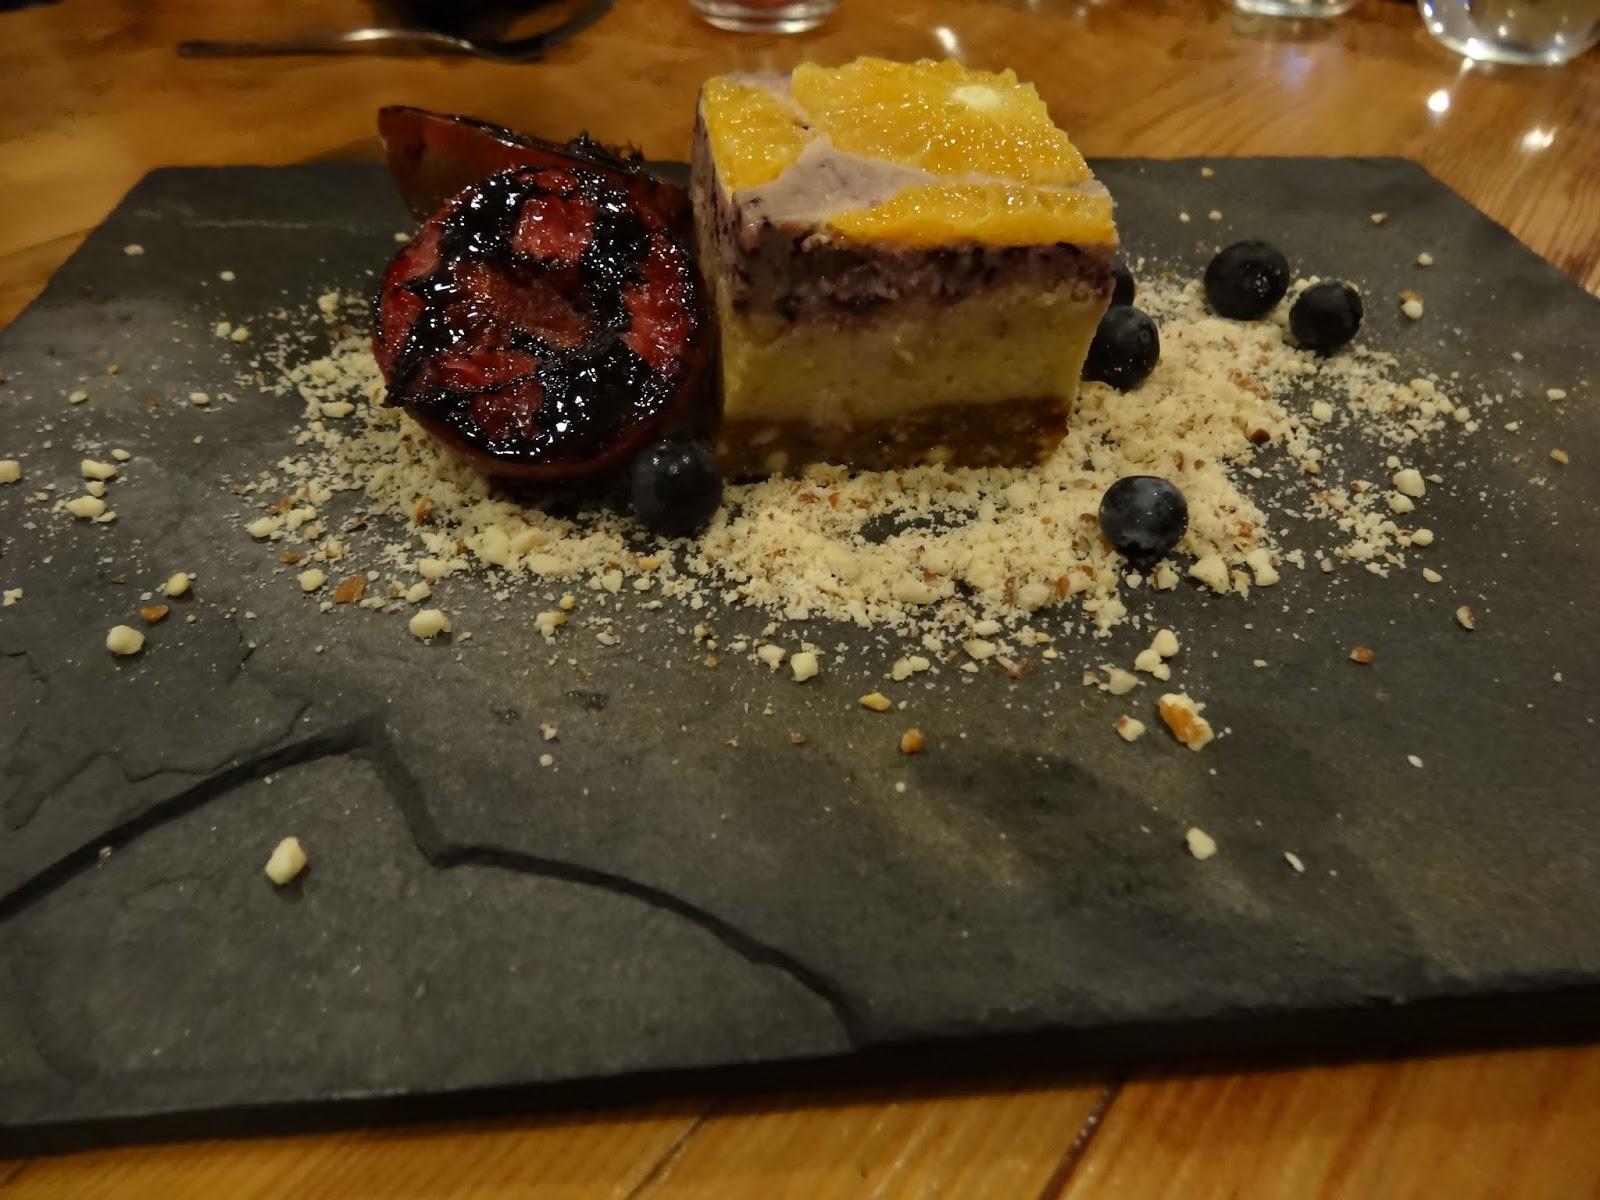 entropy, adelaide, food, thebarton, charbar, fridays, cheesecake, vegan, orange, blueberries